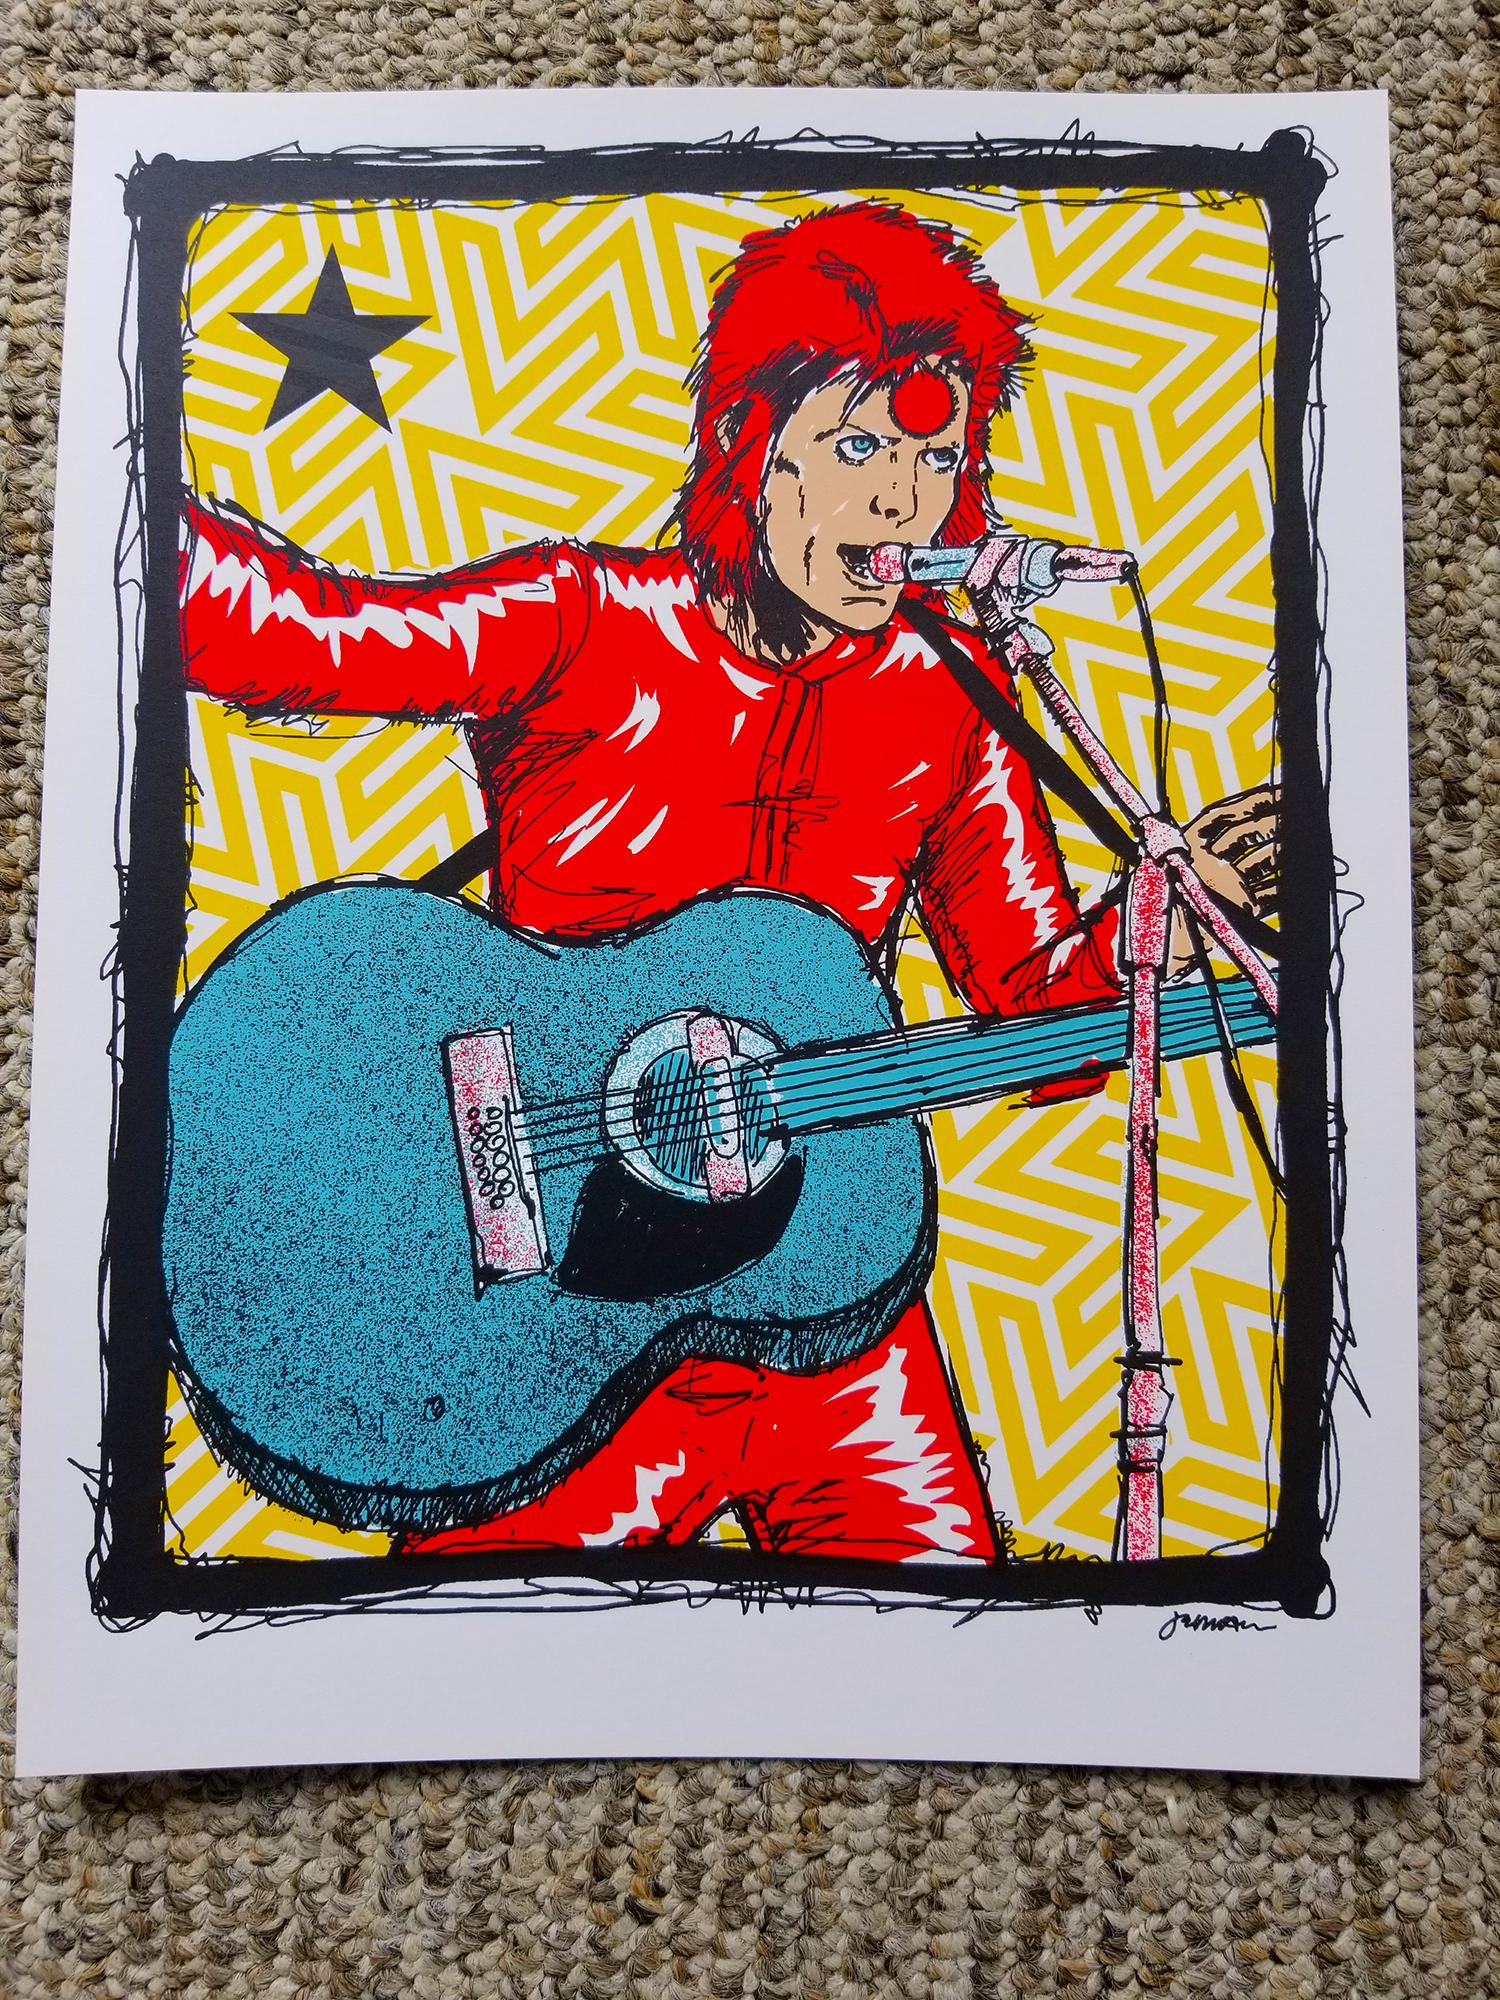 *New* 'I'll Make You A Deal...' (Bowie) Art Mini-Print (ALL VARIANTS)